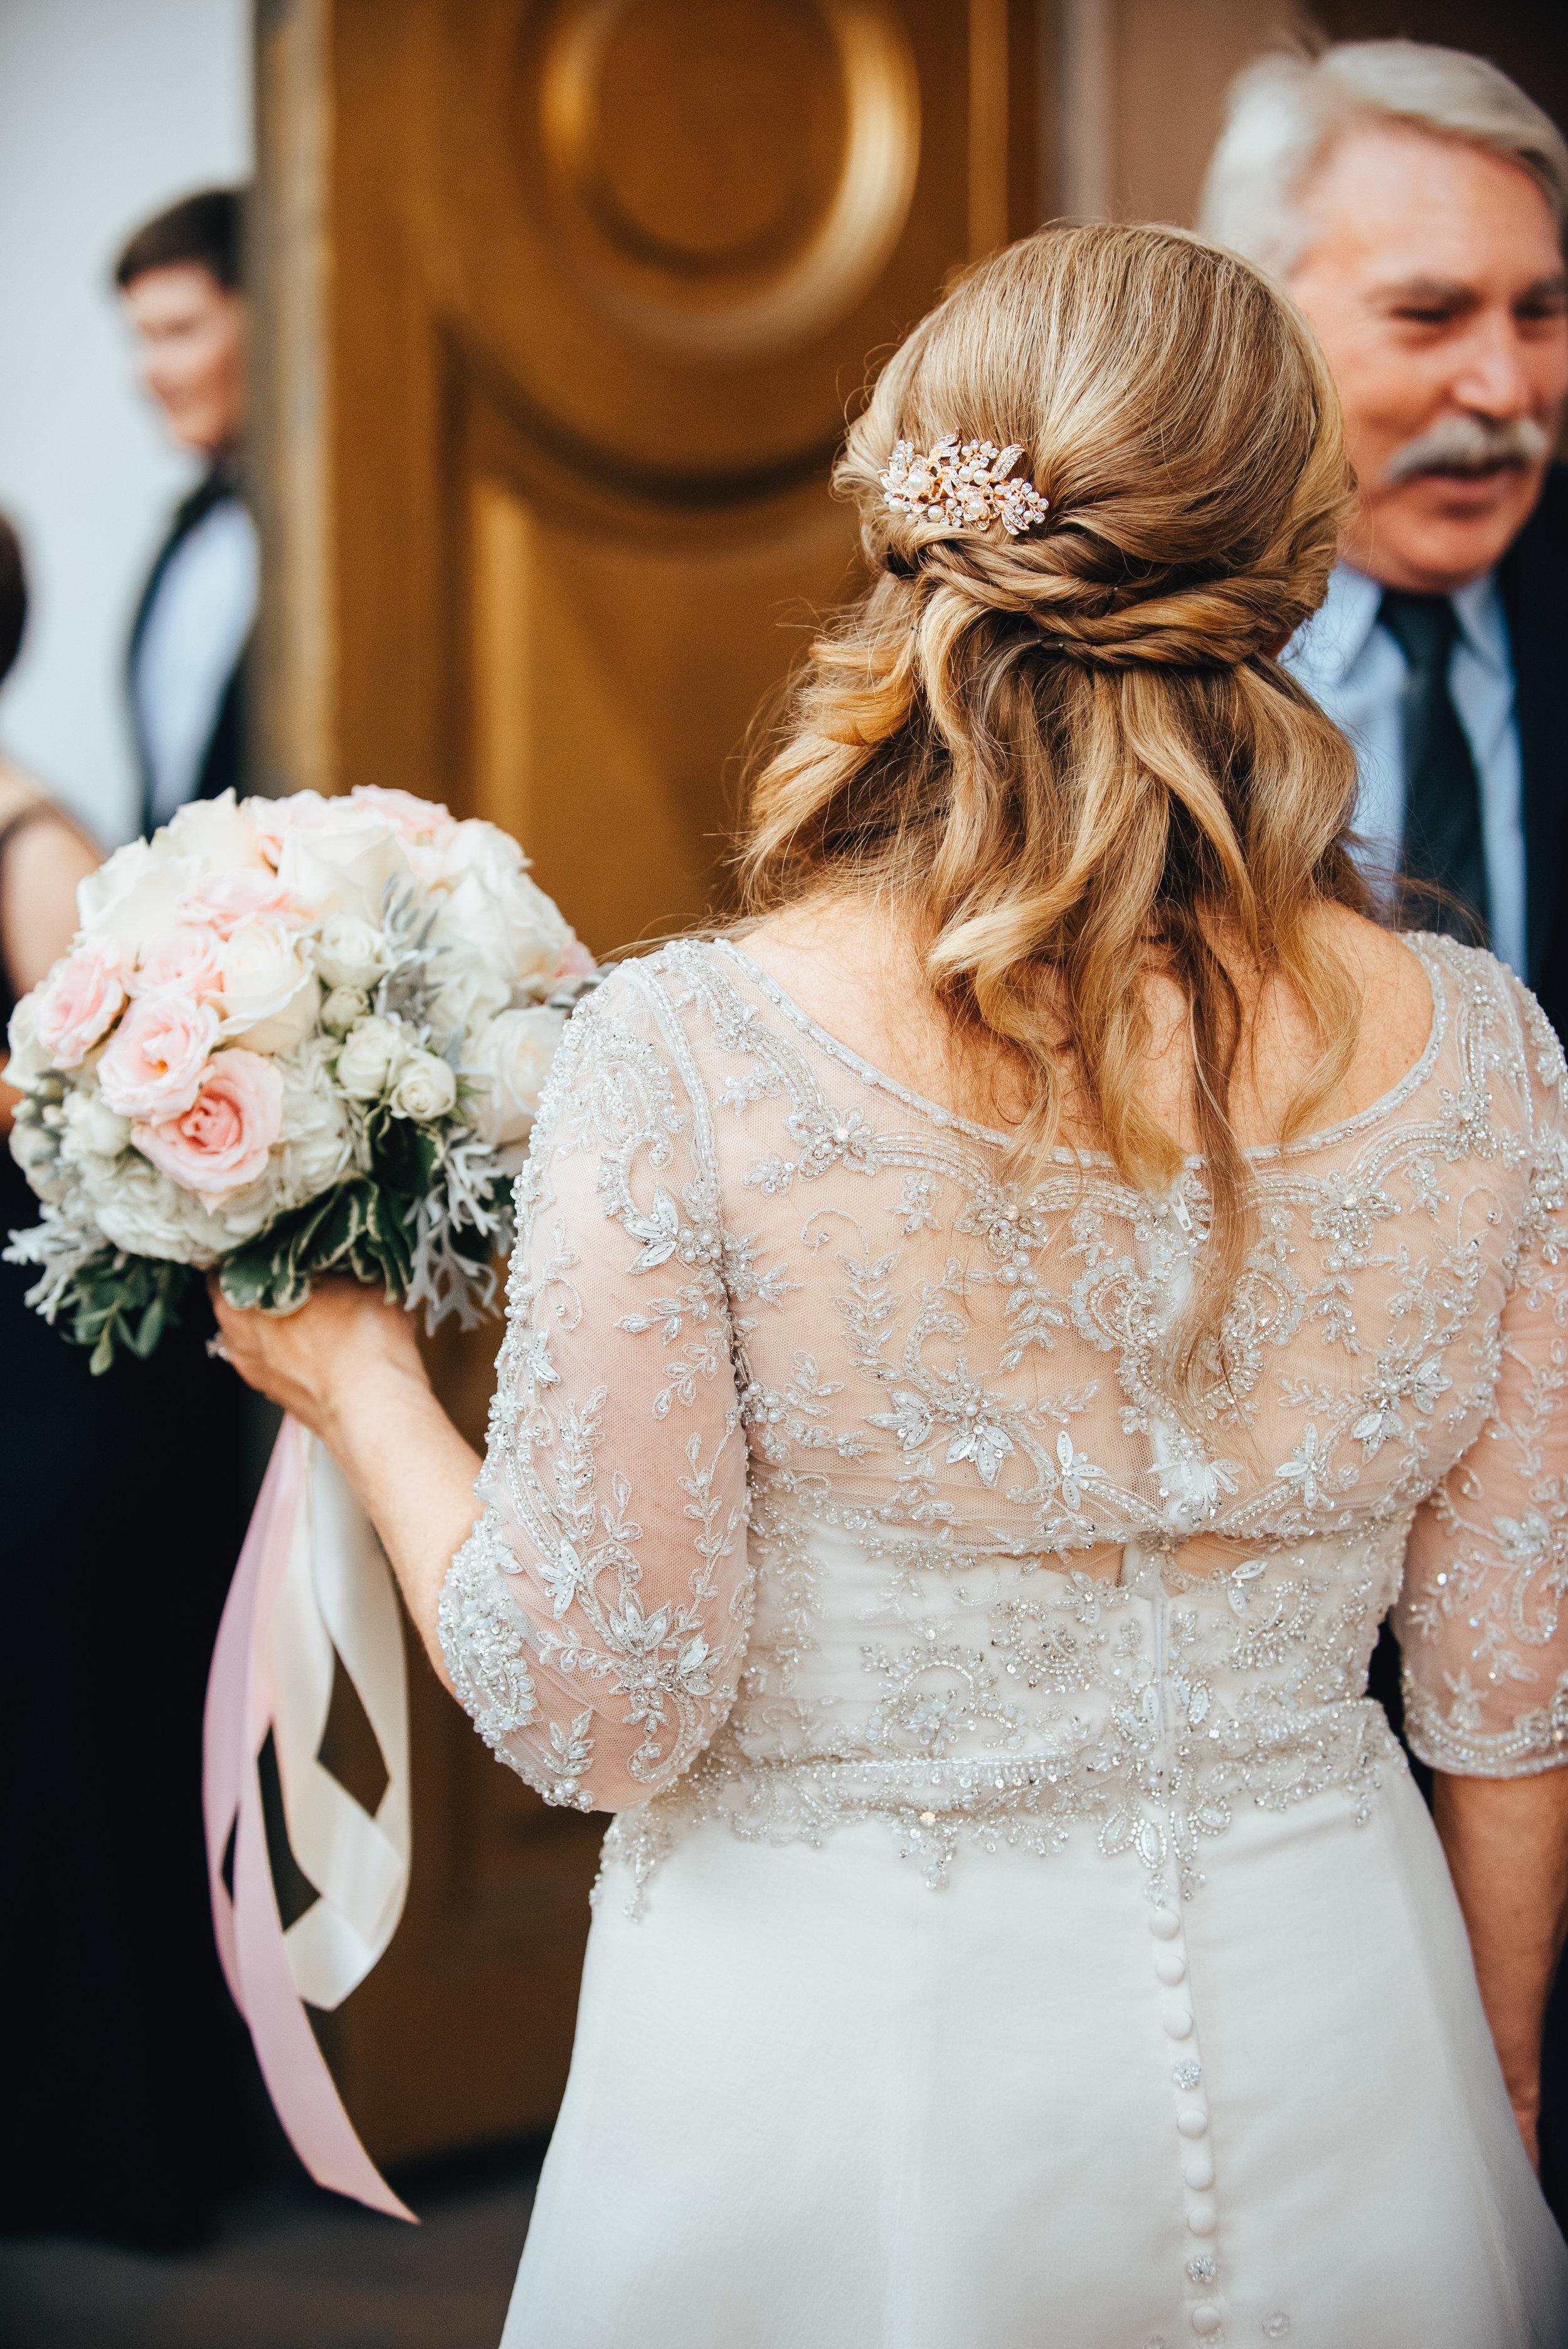 20180828_weddingwebsite_small_23.jpg